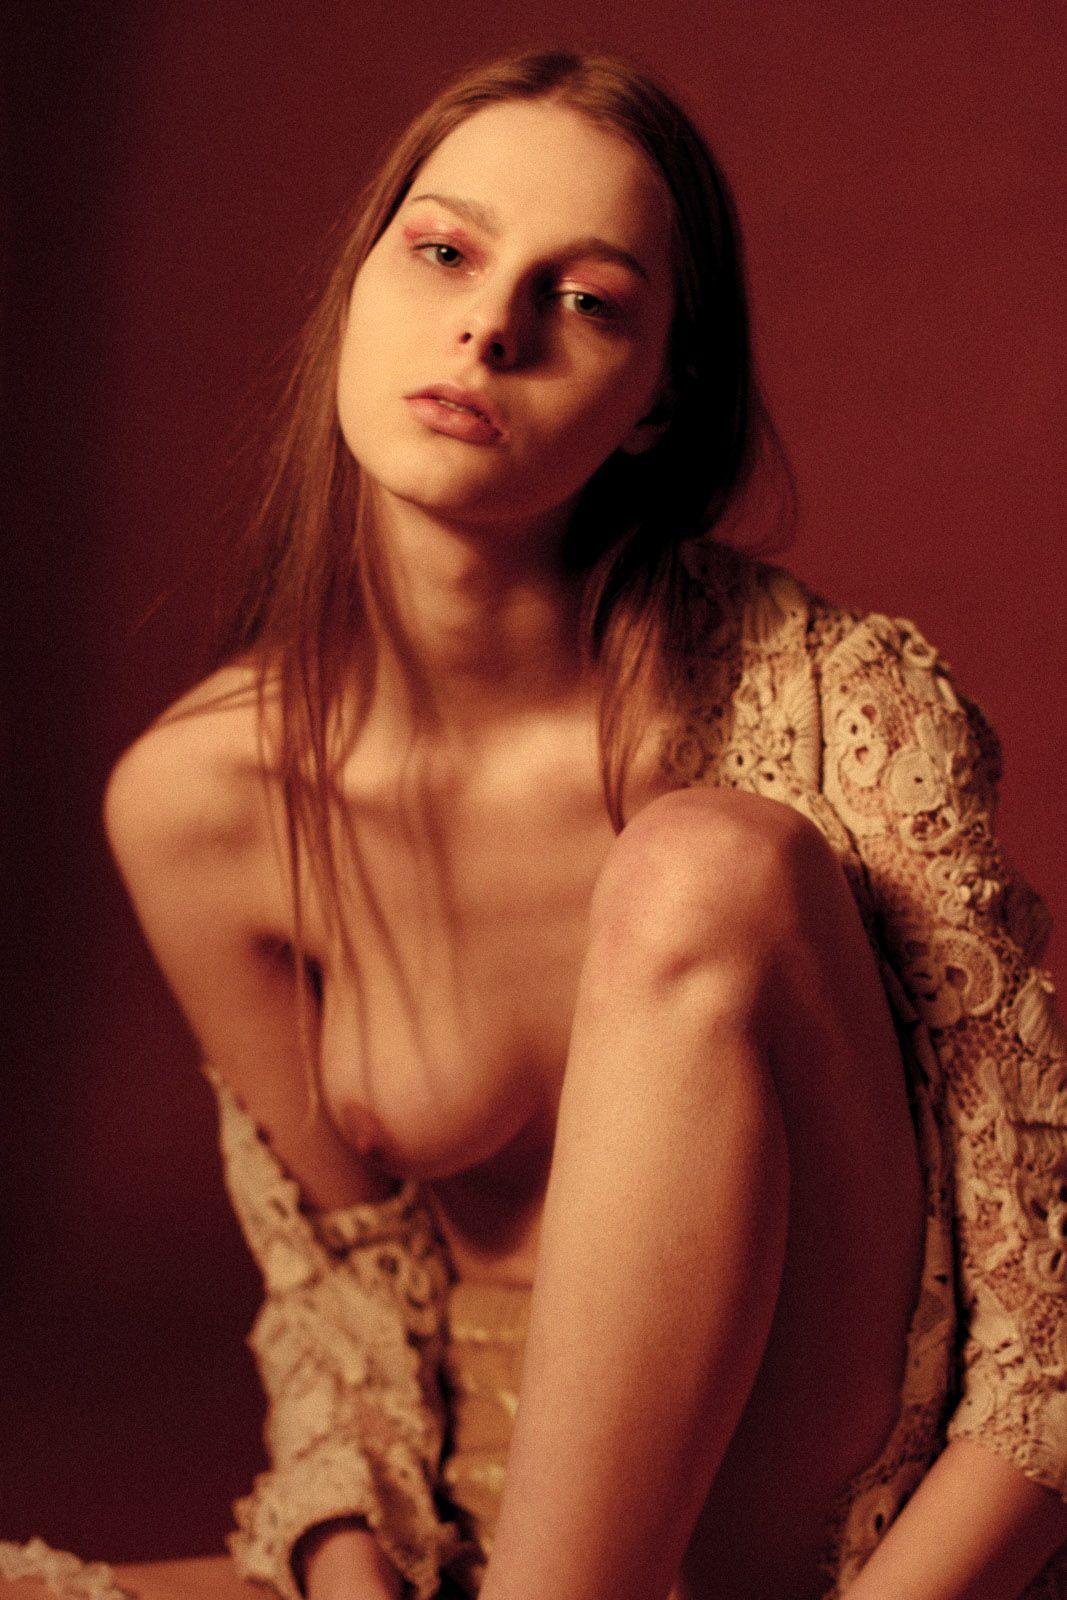 Greta aukstuolyte by marco giuliano mq photo shoot